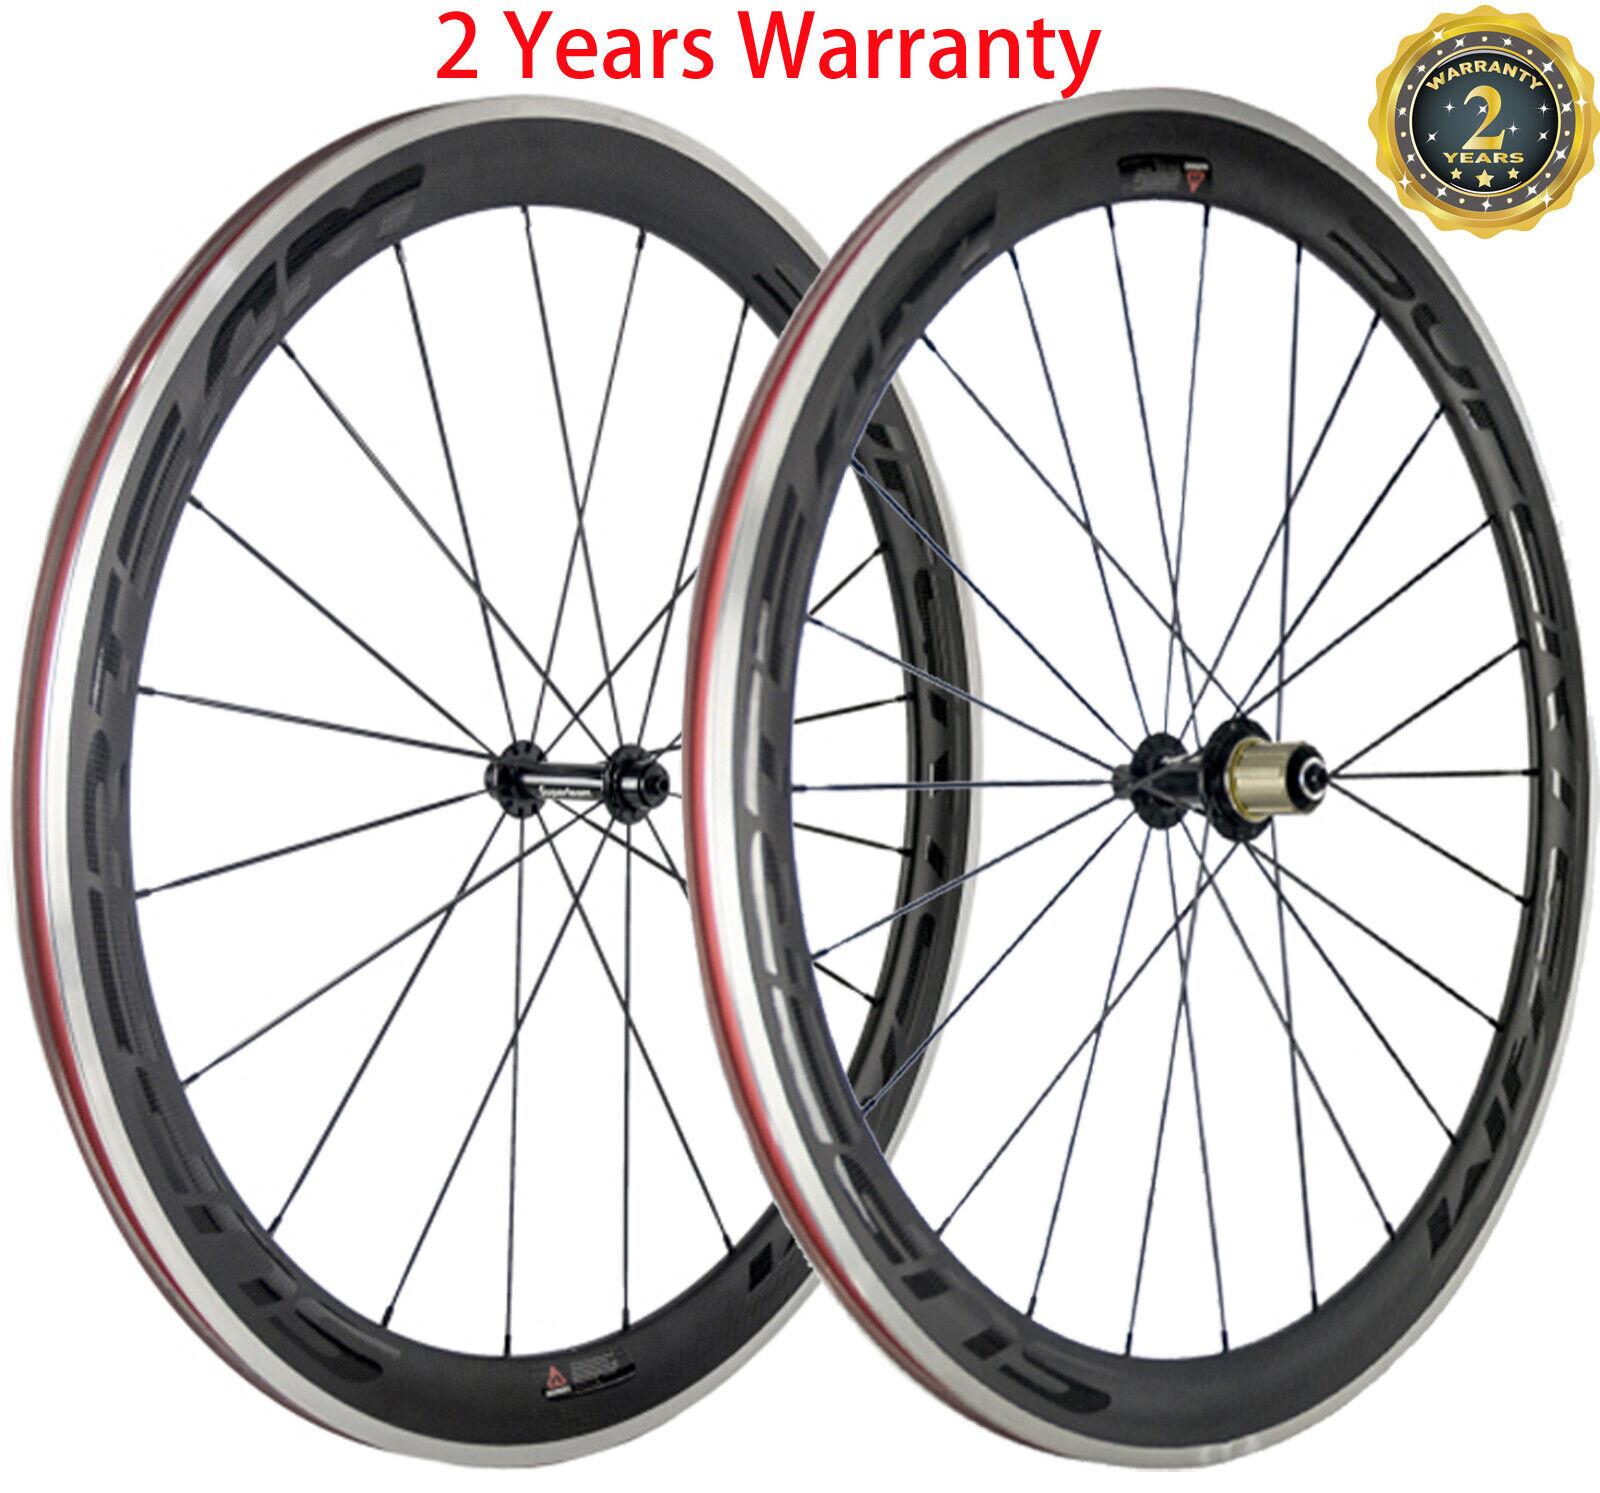 Carbon  Wheels Road Bike 50mm Aluminum Brake Surface Clincher Wheelset 700C Bike  quality assurance